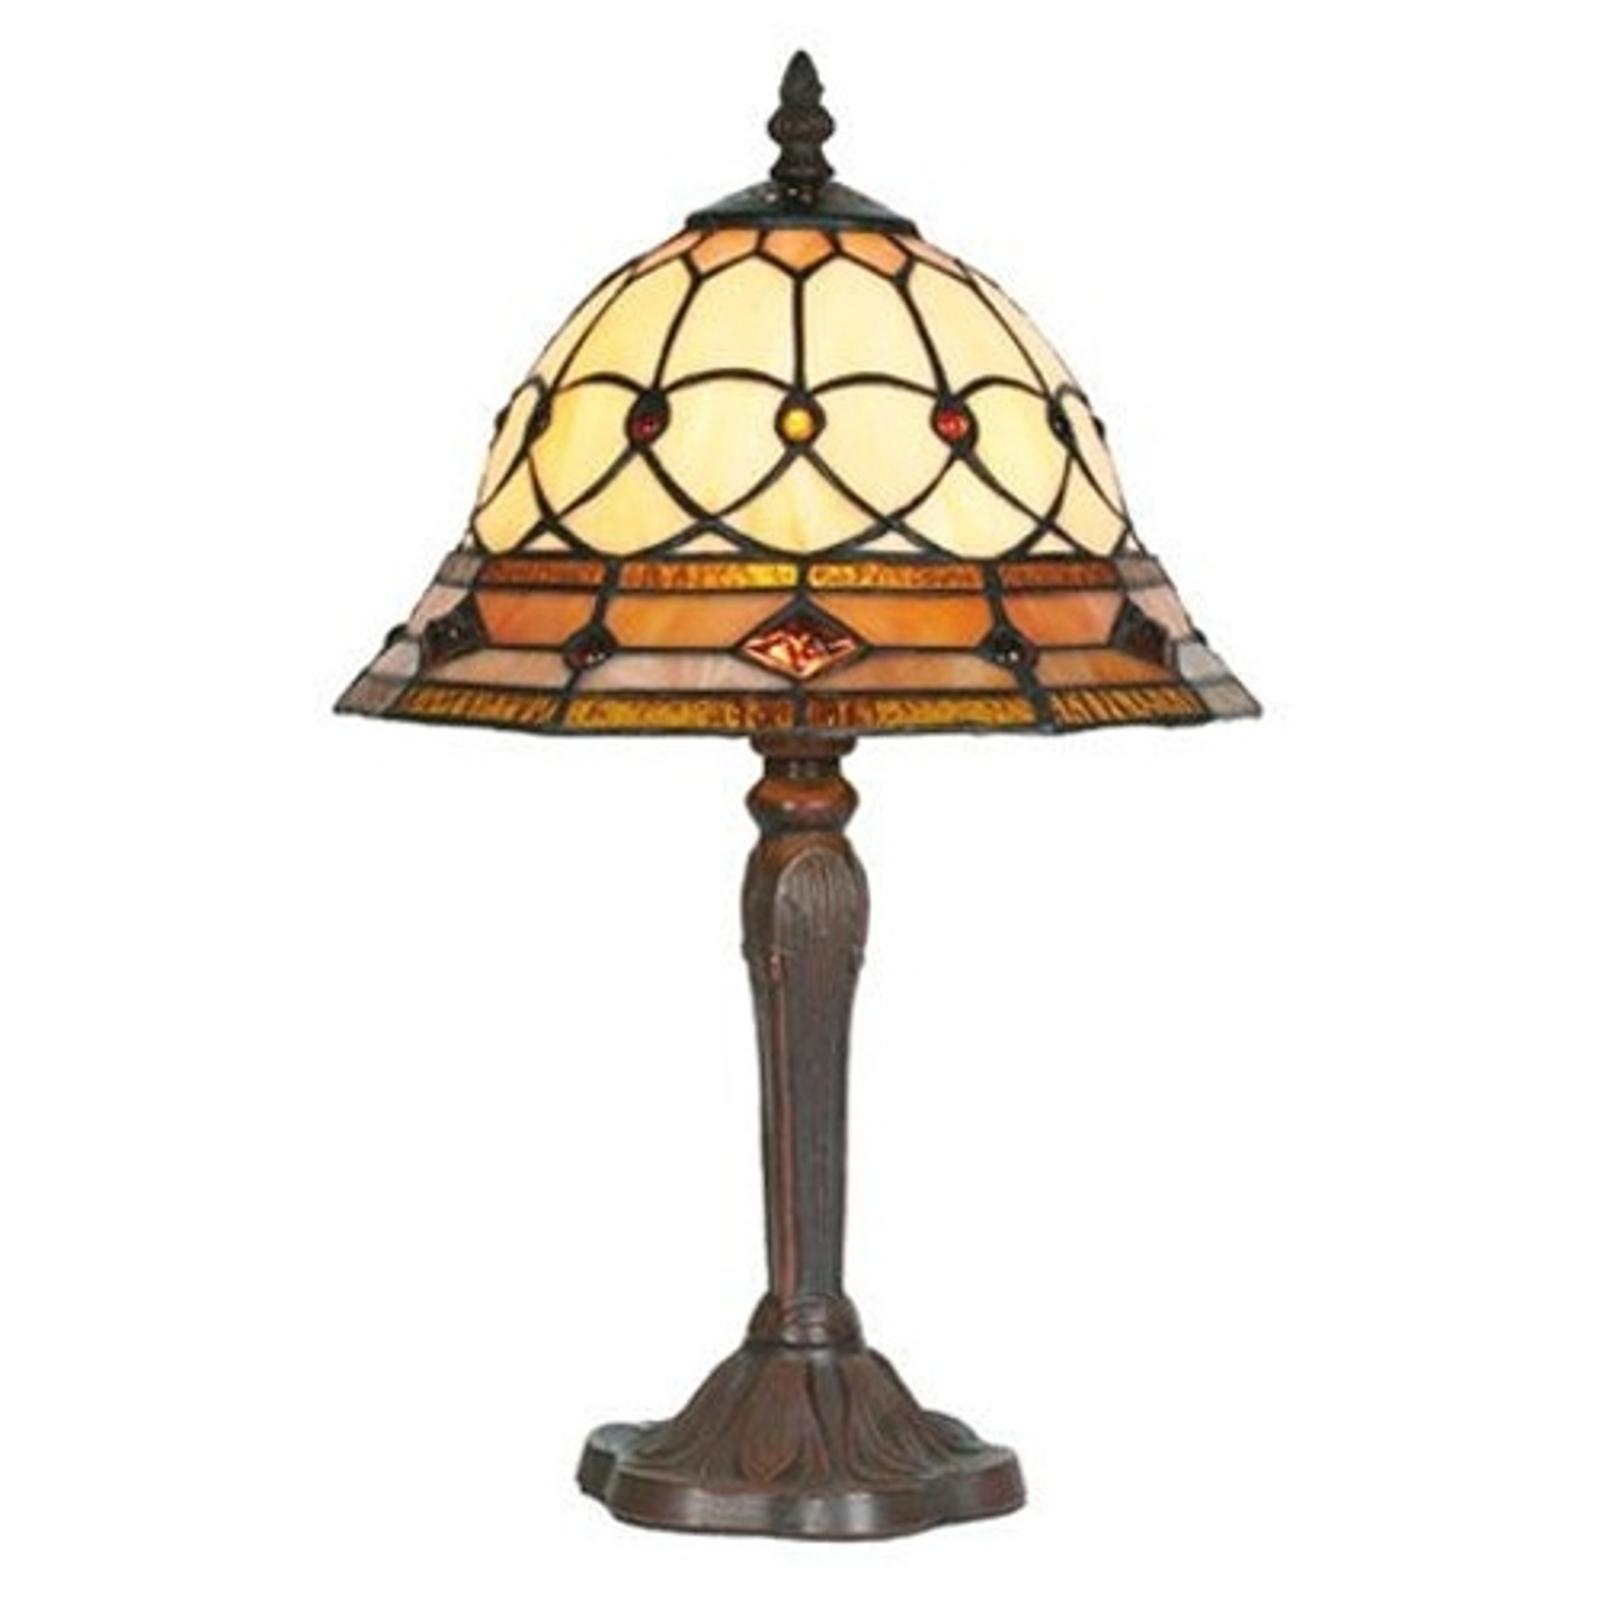 ANTHEA bordslampa i tiffanystil